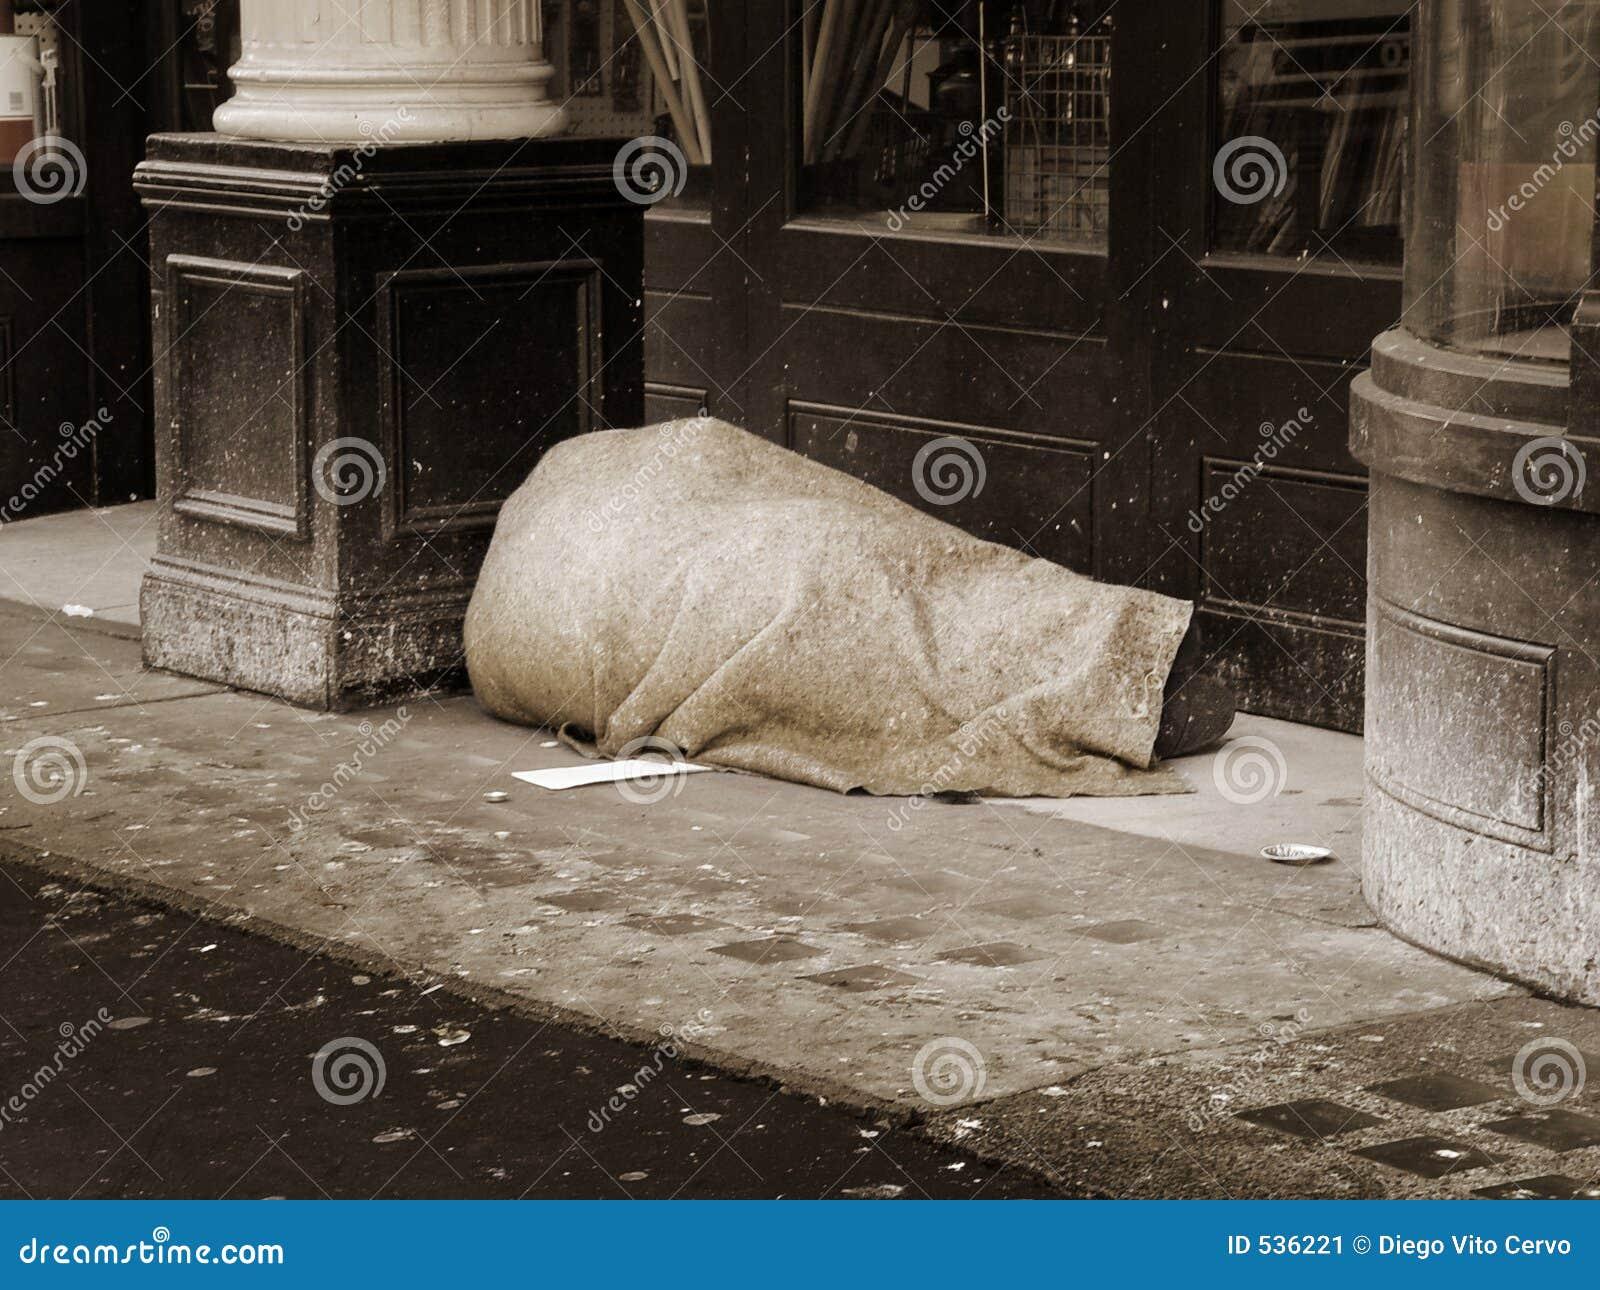 Download 无家可归的人 库存图片. 图片 包括有 生活, 叫化子, 减速火箭, 街道, 较少, 酒精, 界面, 乌贼属 - 536221